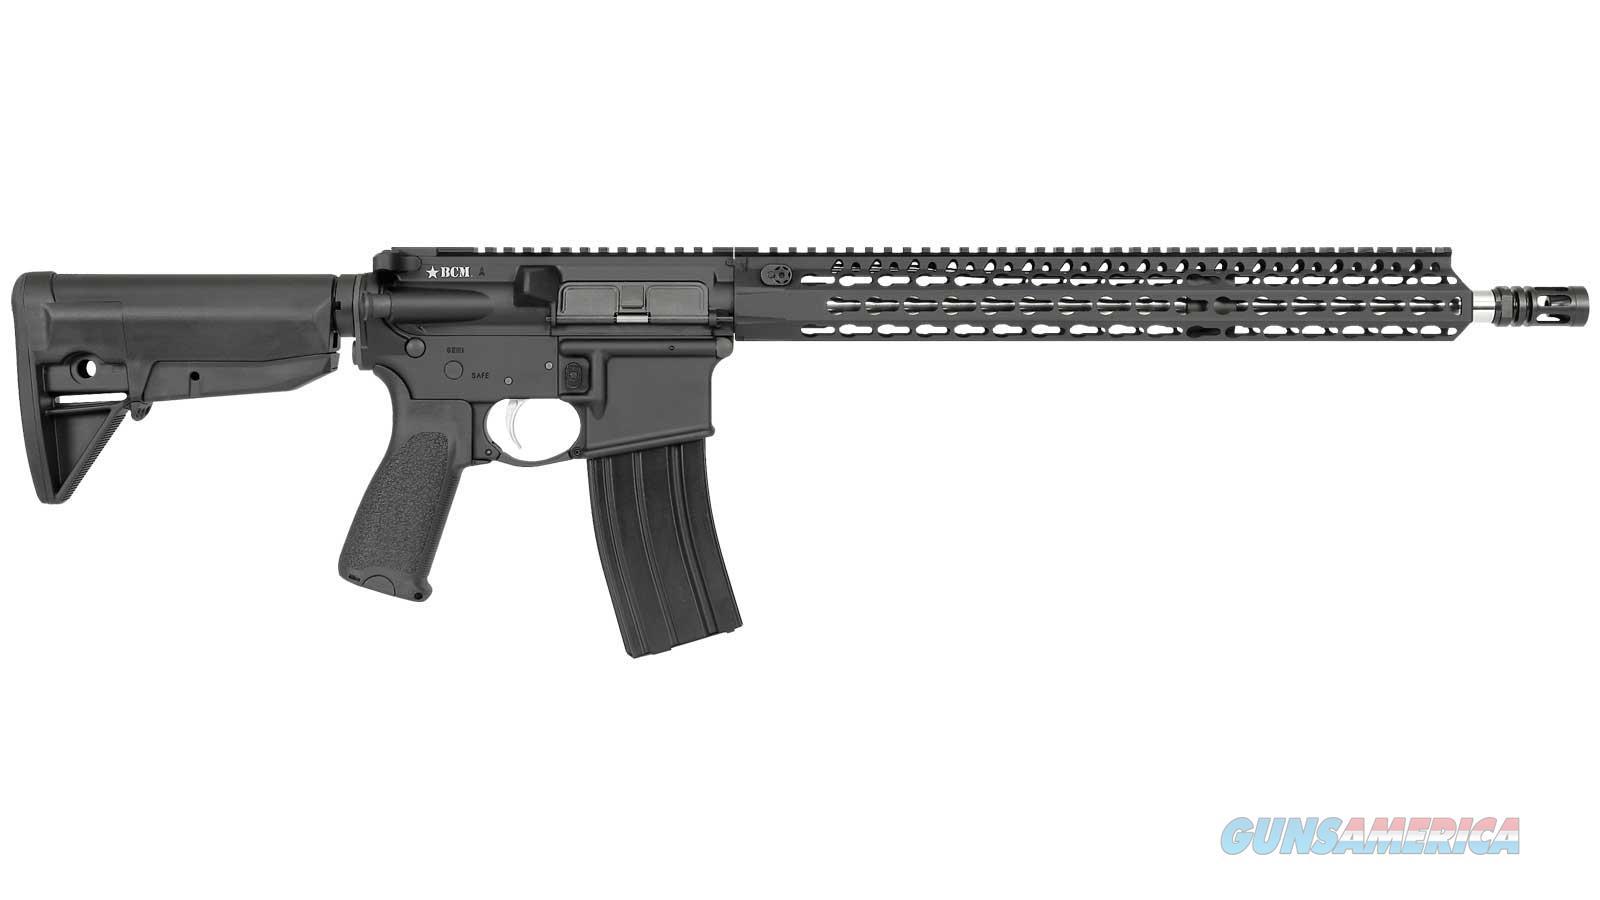 Bravo Company Usa Recce 16 Kmr-A Precision 752-790  Guns > Rifles > B Misc Rifles